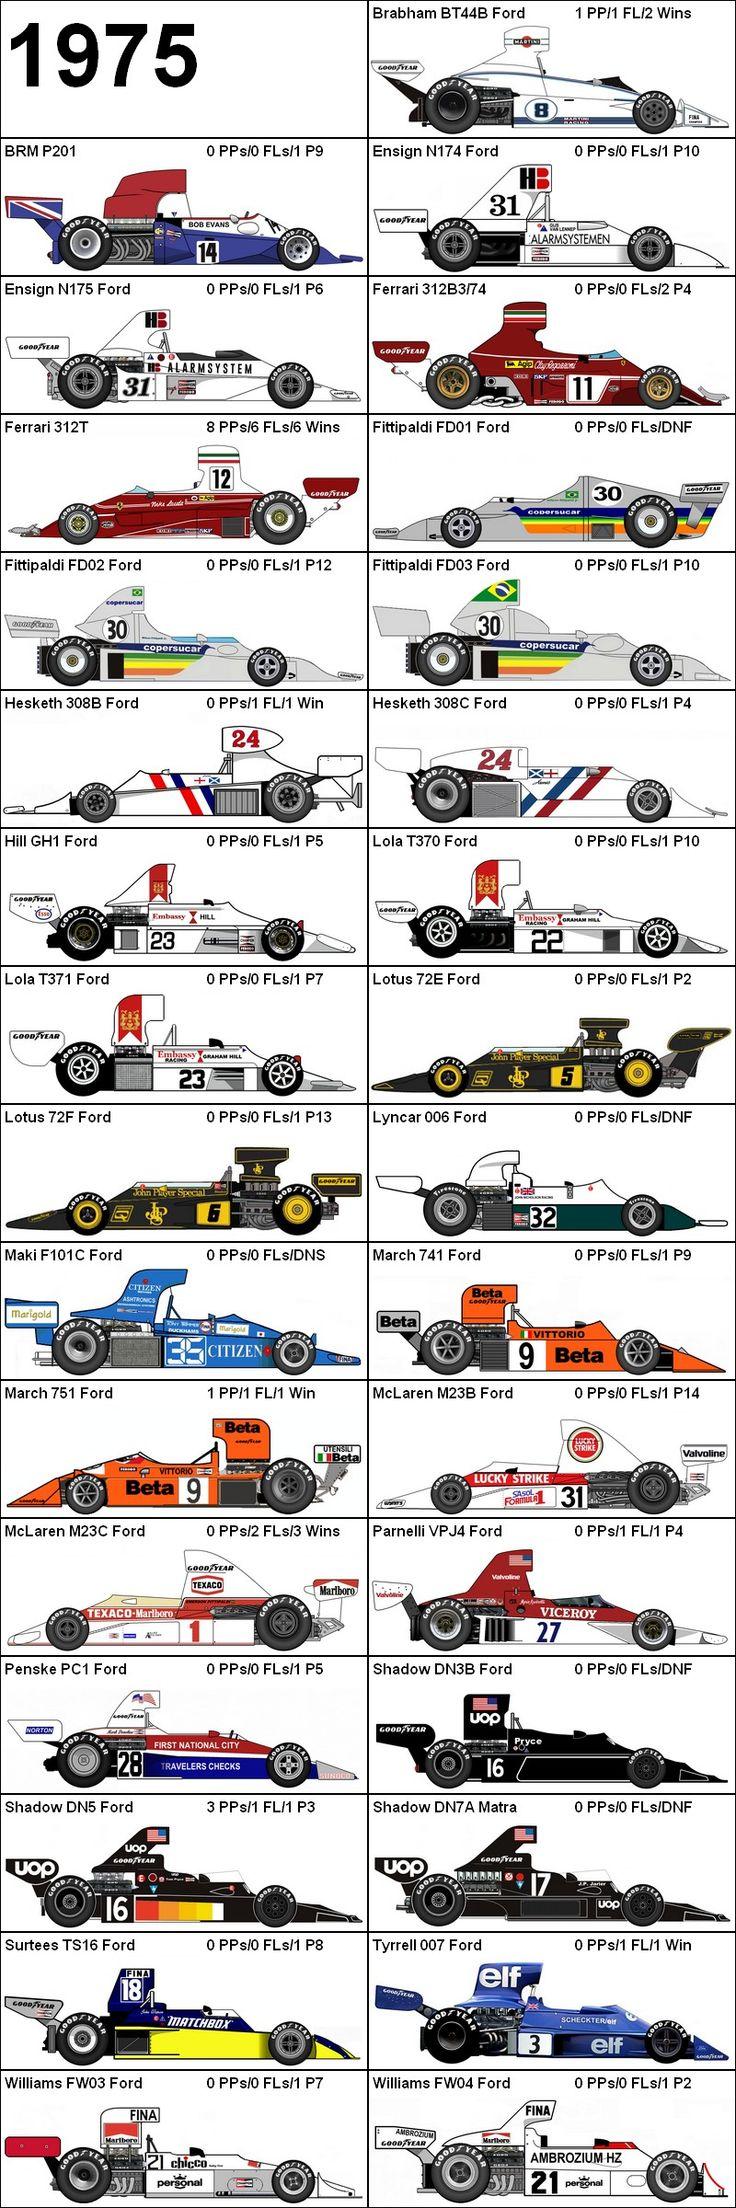 Formula One Grand Prix 1975 Cars